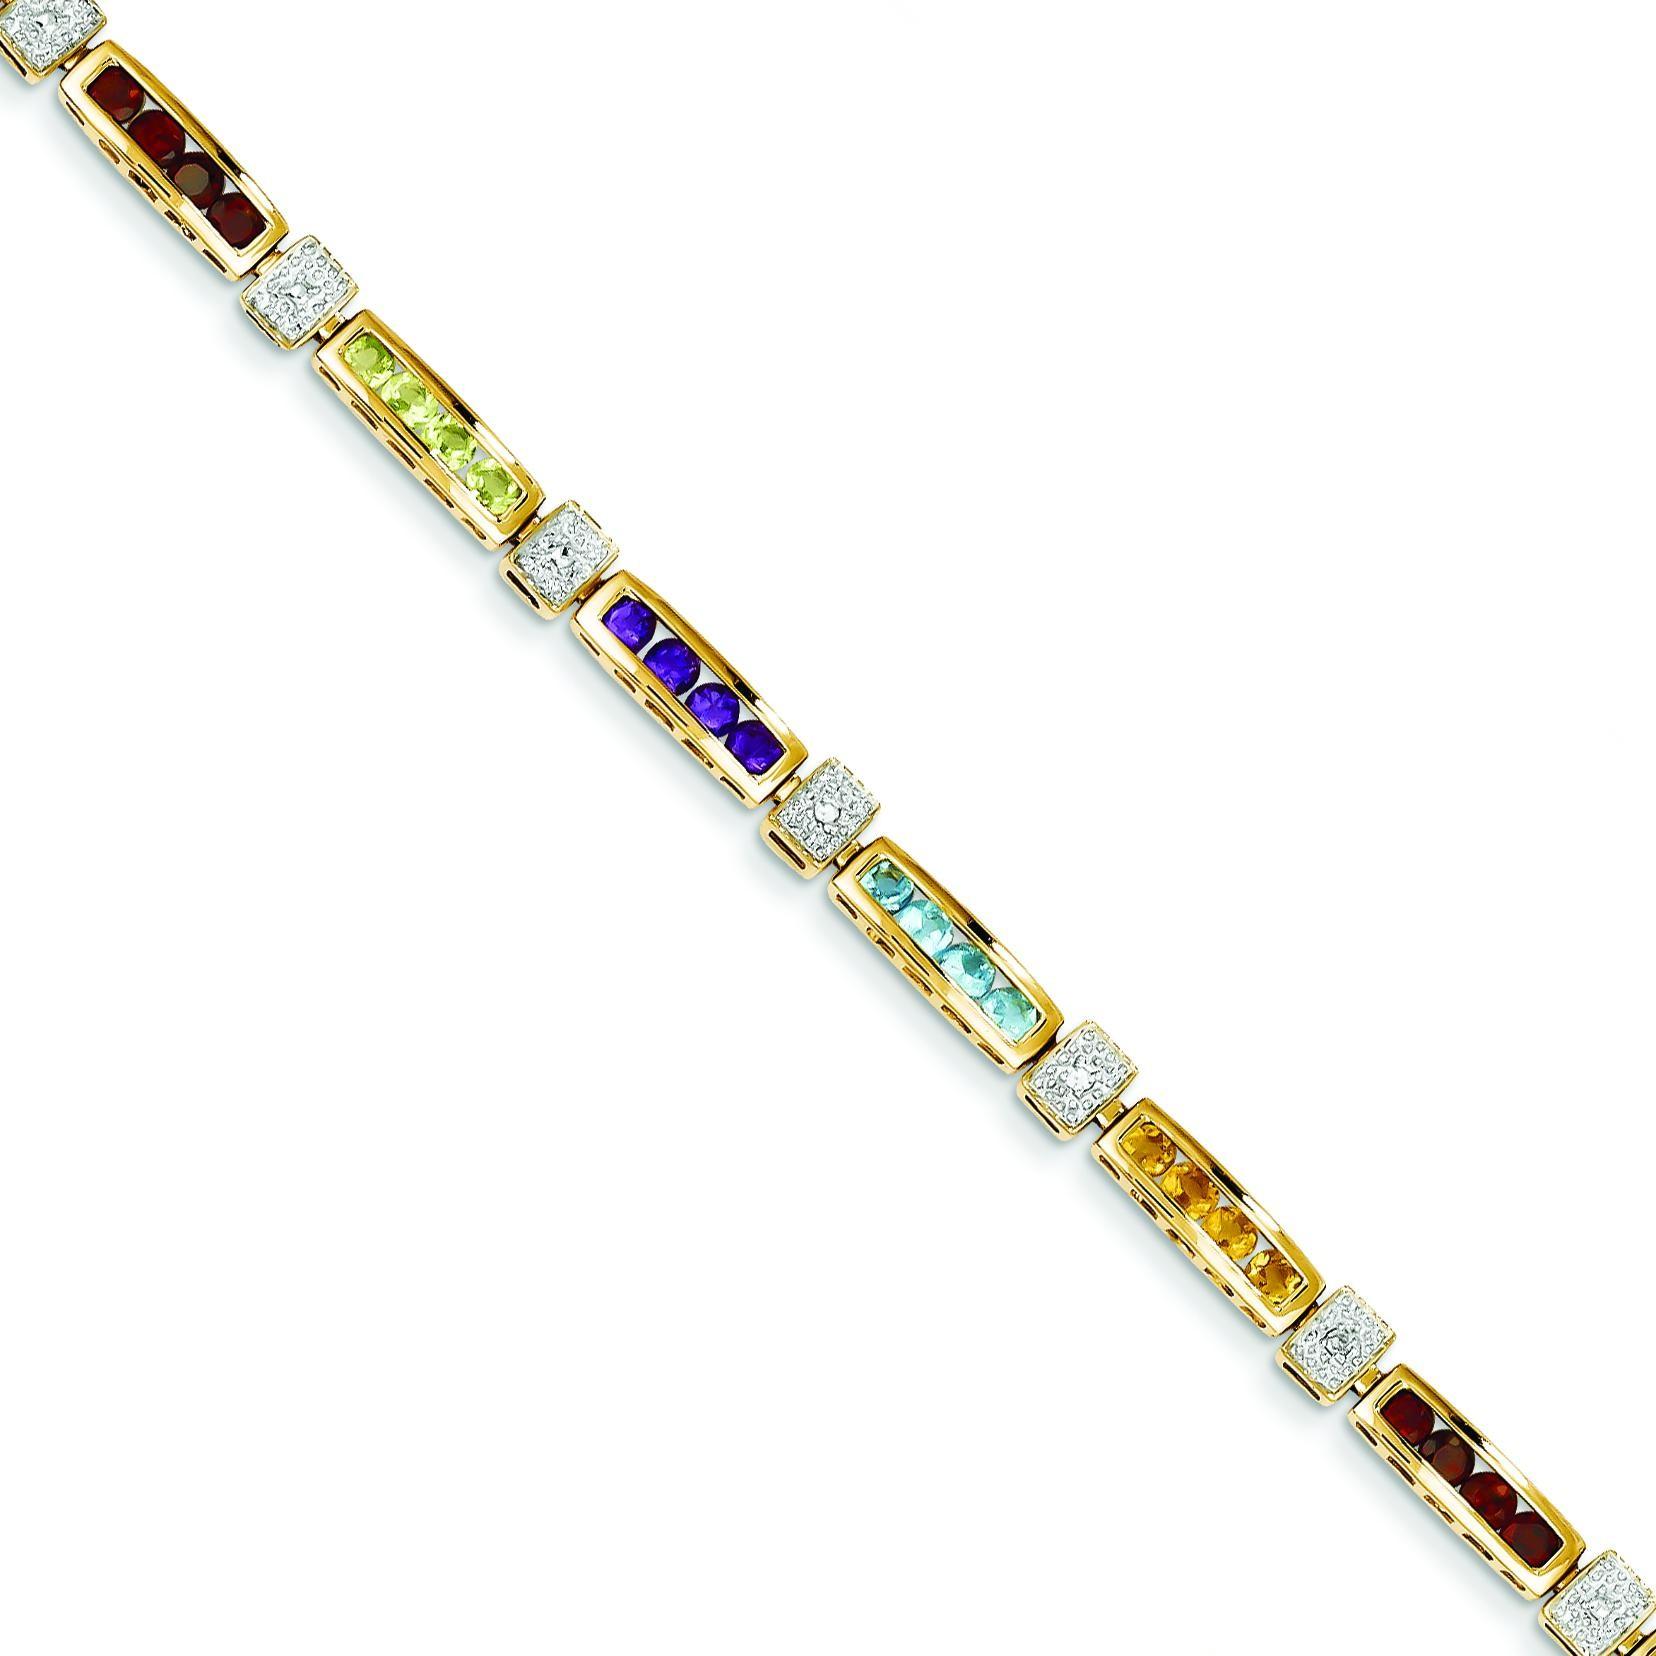 Fancy Genuine Diamond Gemstone Rainbow in 14k Yellow Gold